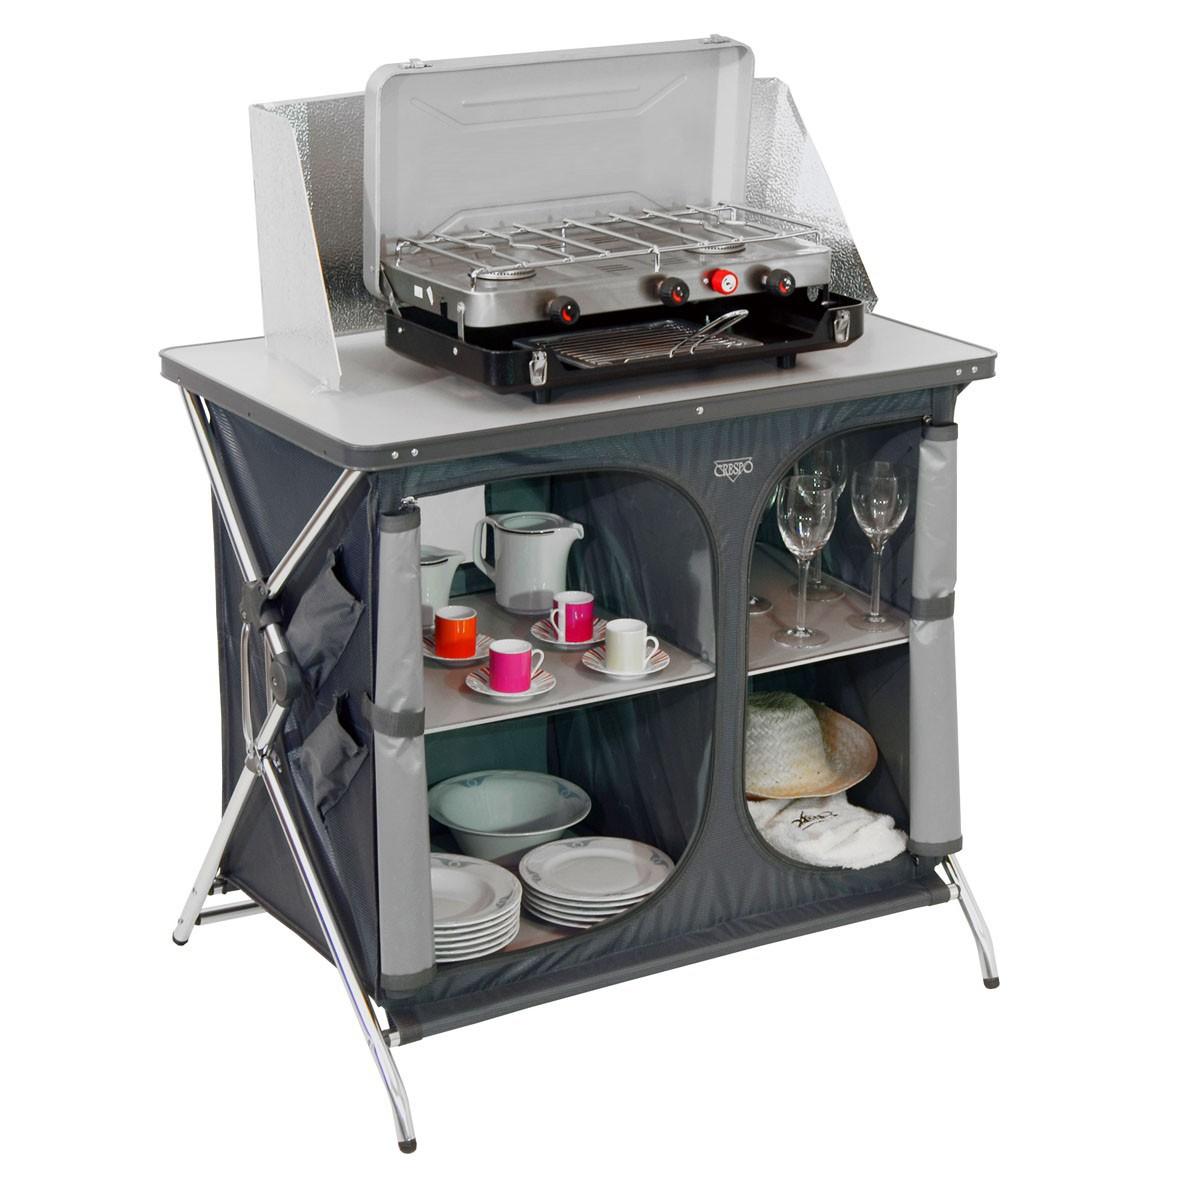 Mueble de cocina camping - Cocina camping carrefour ...